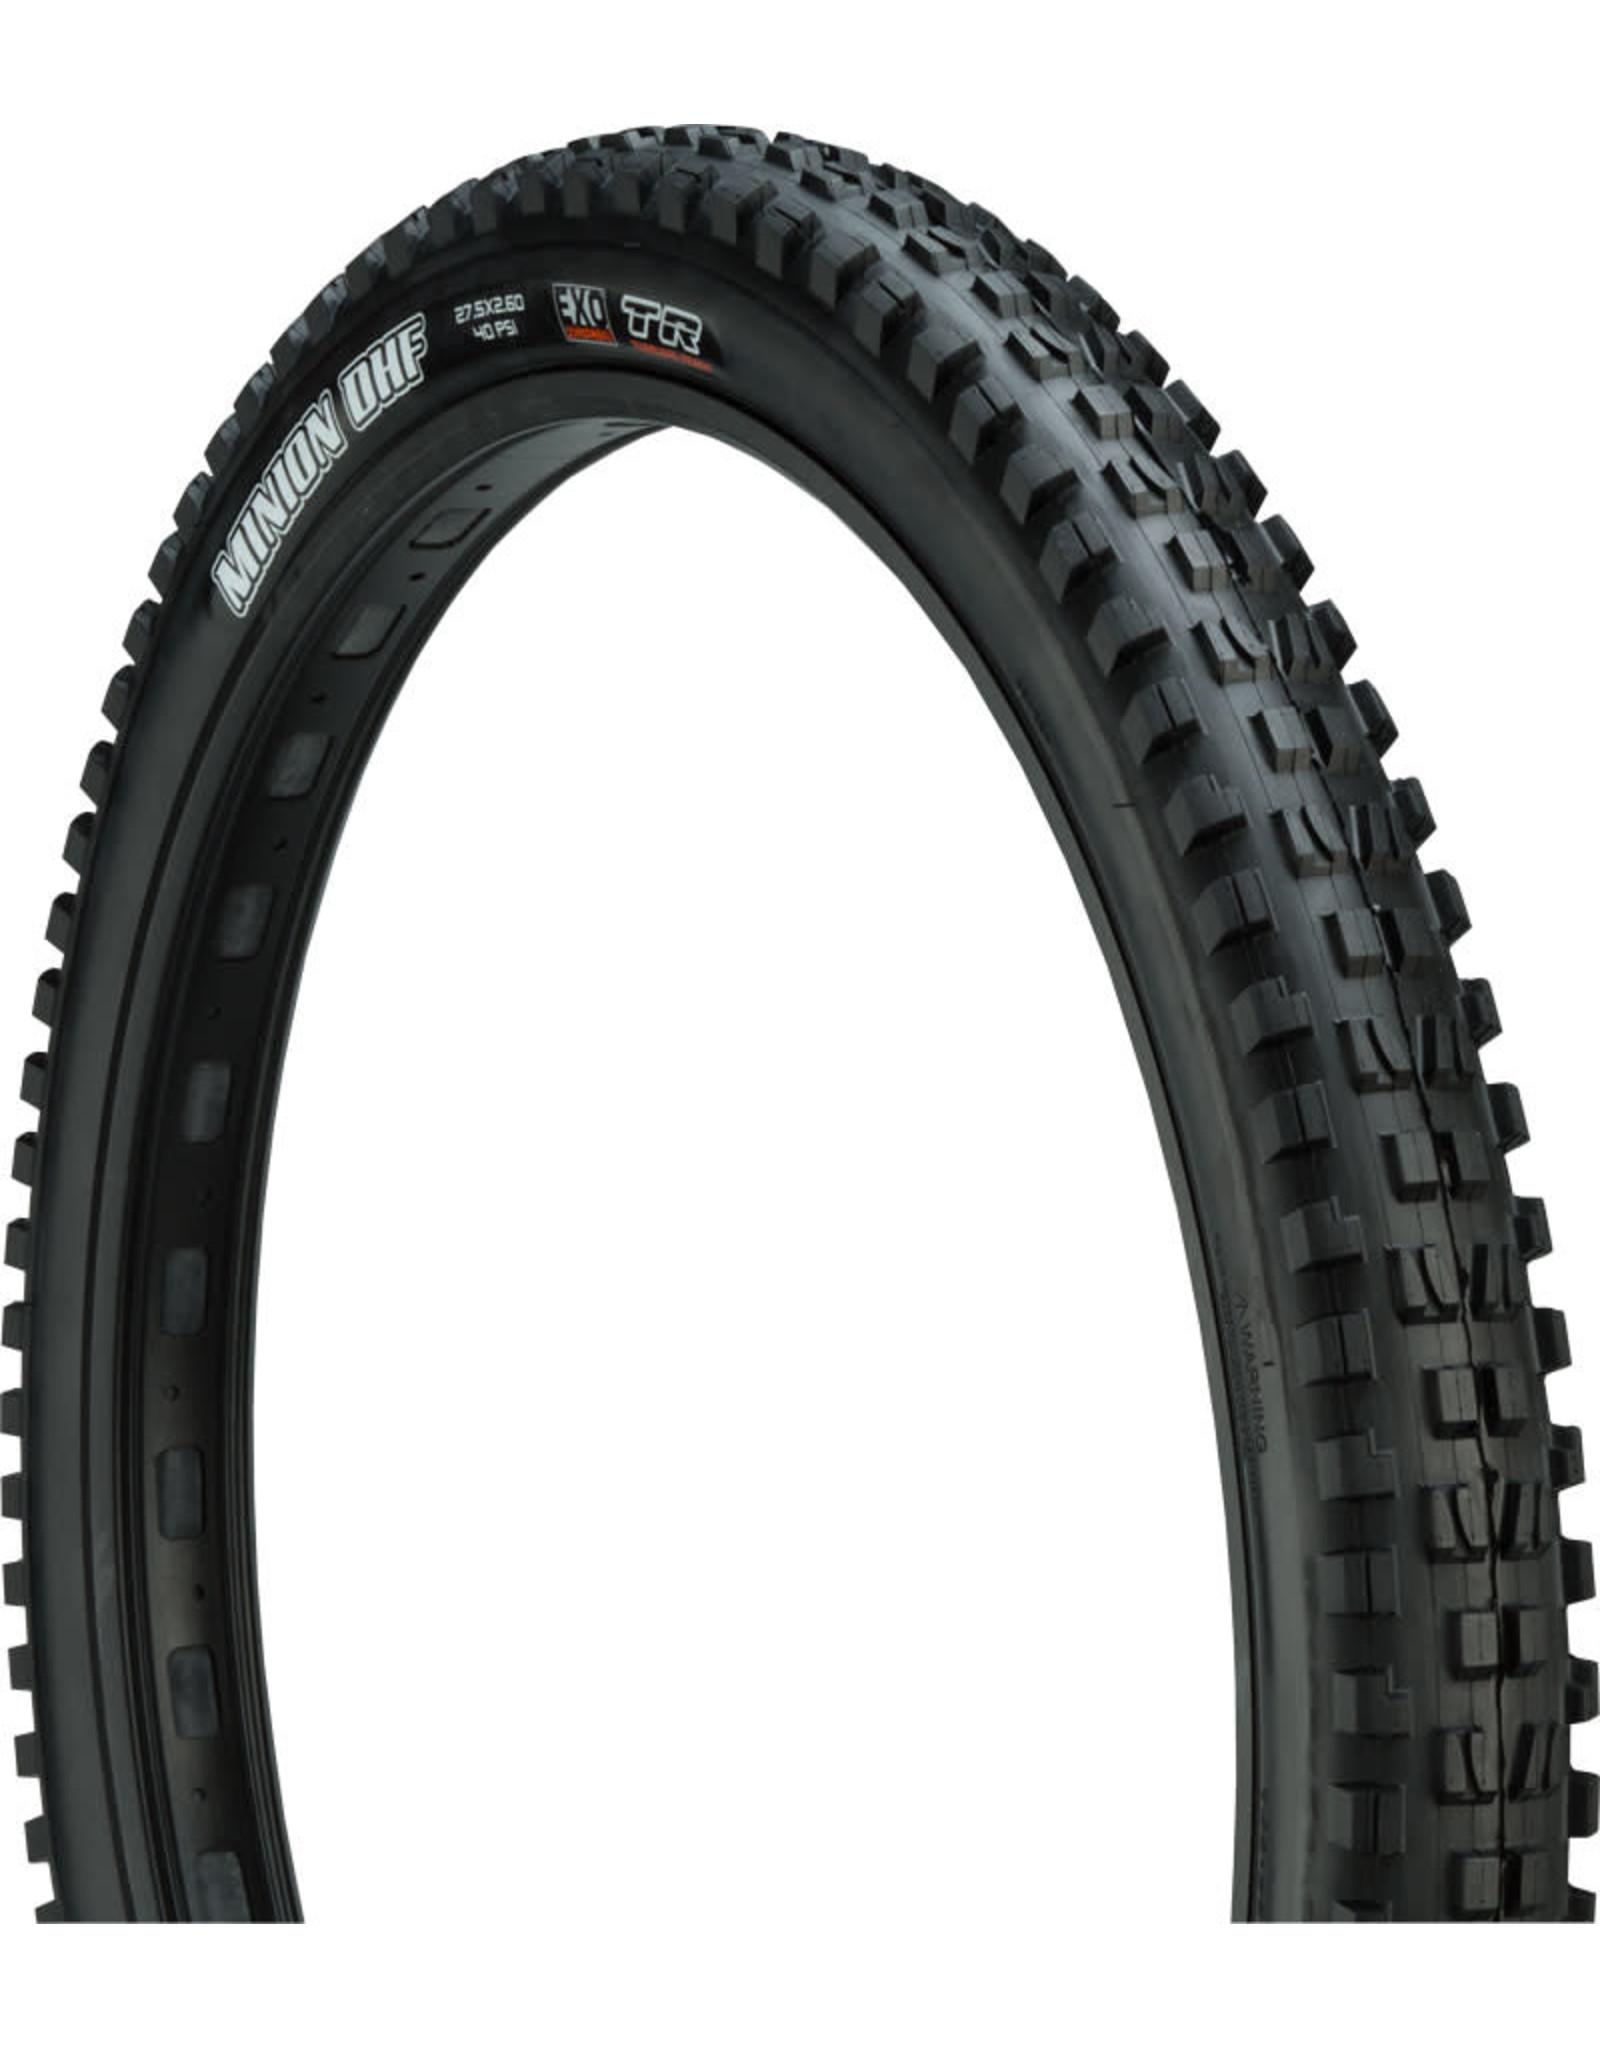 Maxxis Maxxis Minion DHF Tire - 27.5 x 2.6, Tubeless, Folding, Black, Dual, EXO